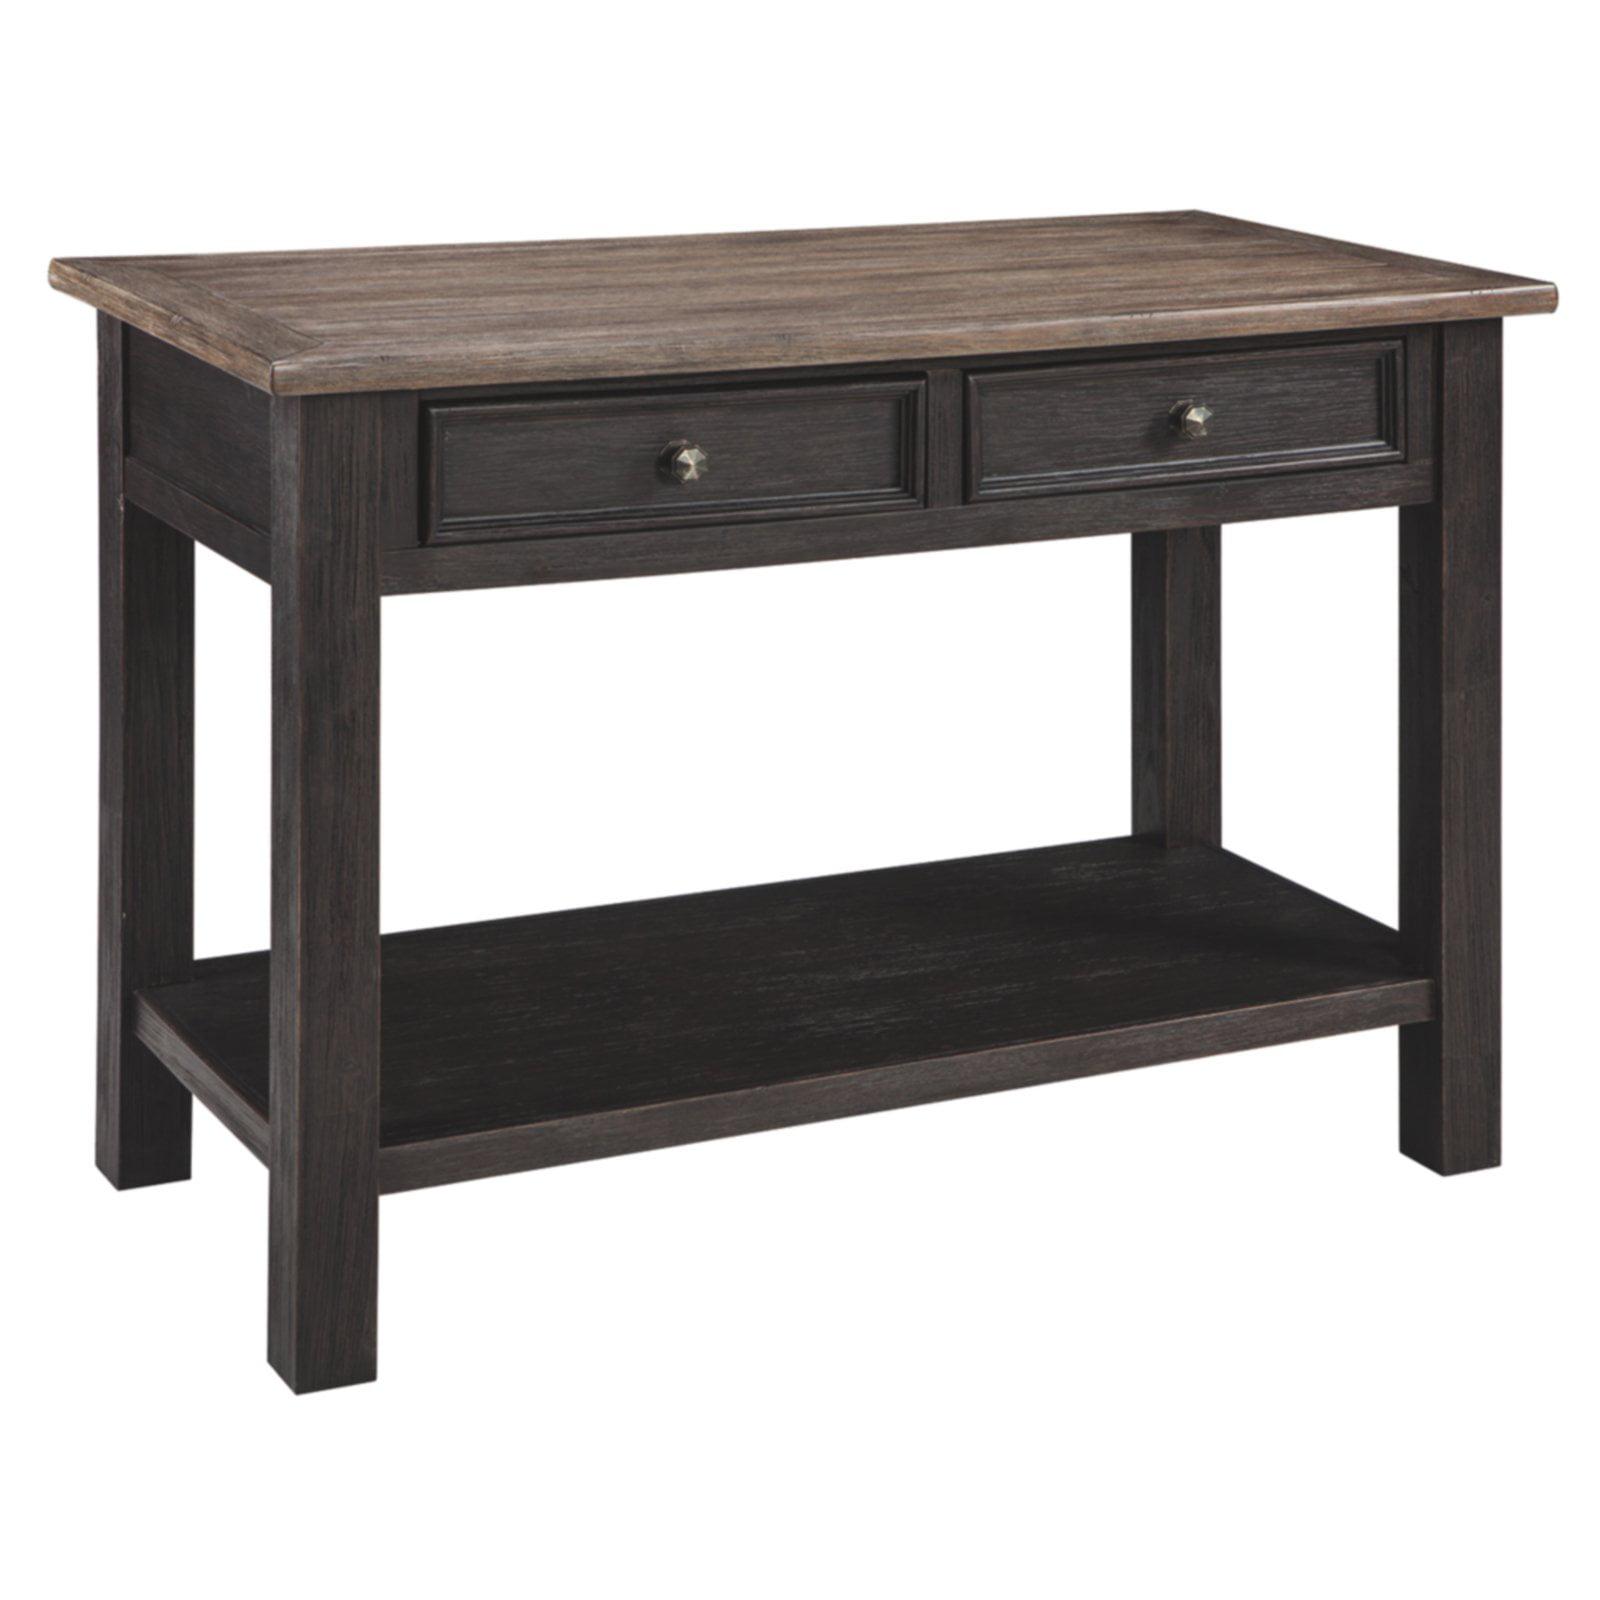 Signature Design by Ashley Tyler Creek Rectangular 2 Drawer Sofa Table